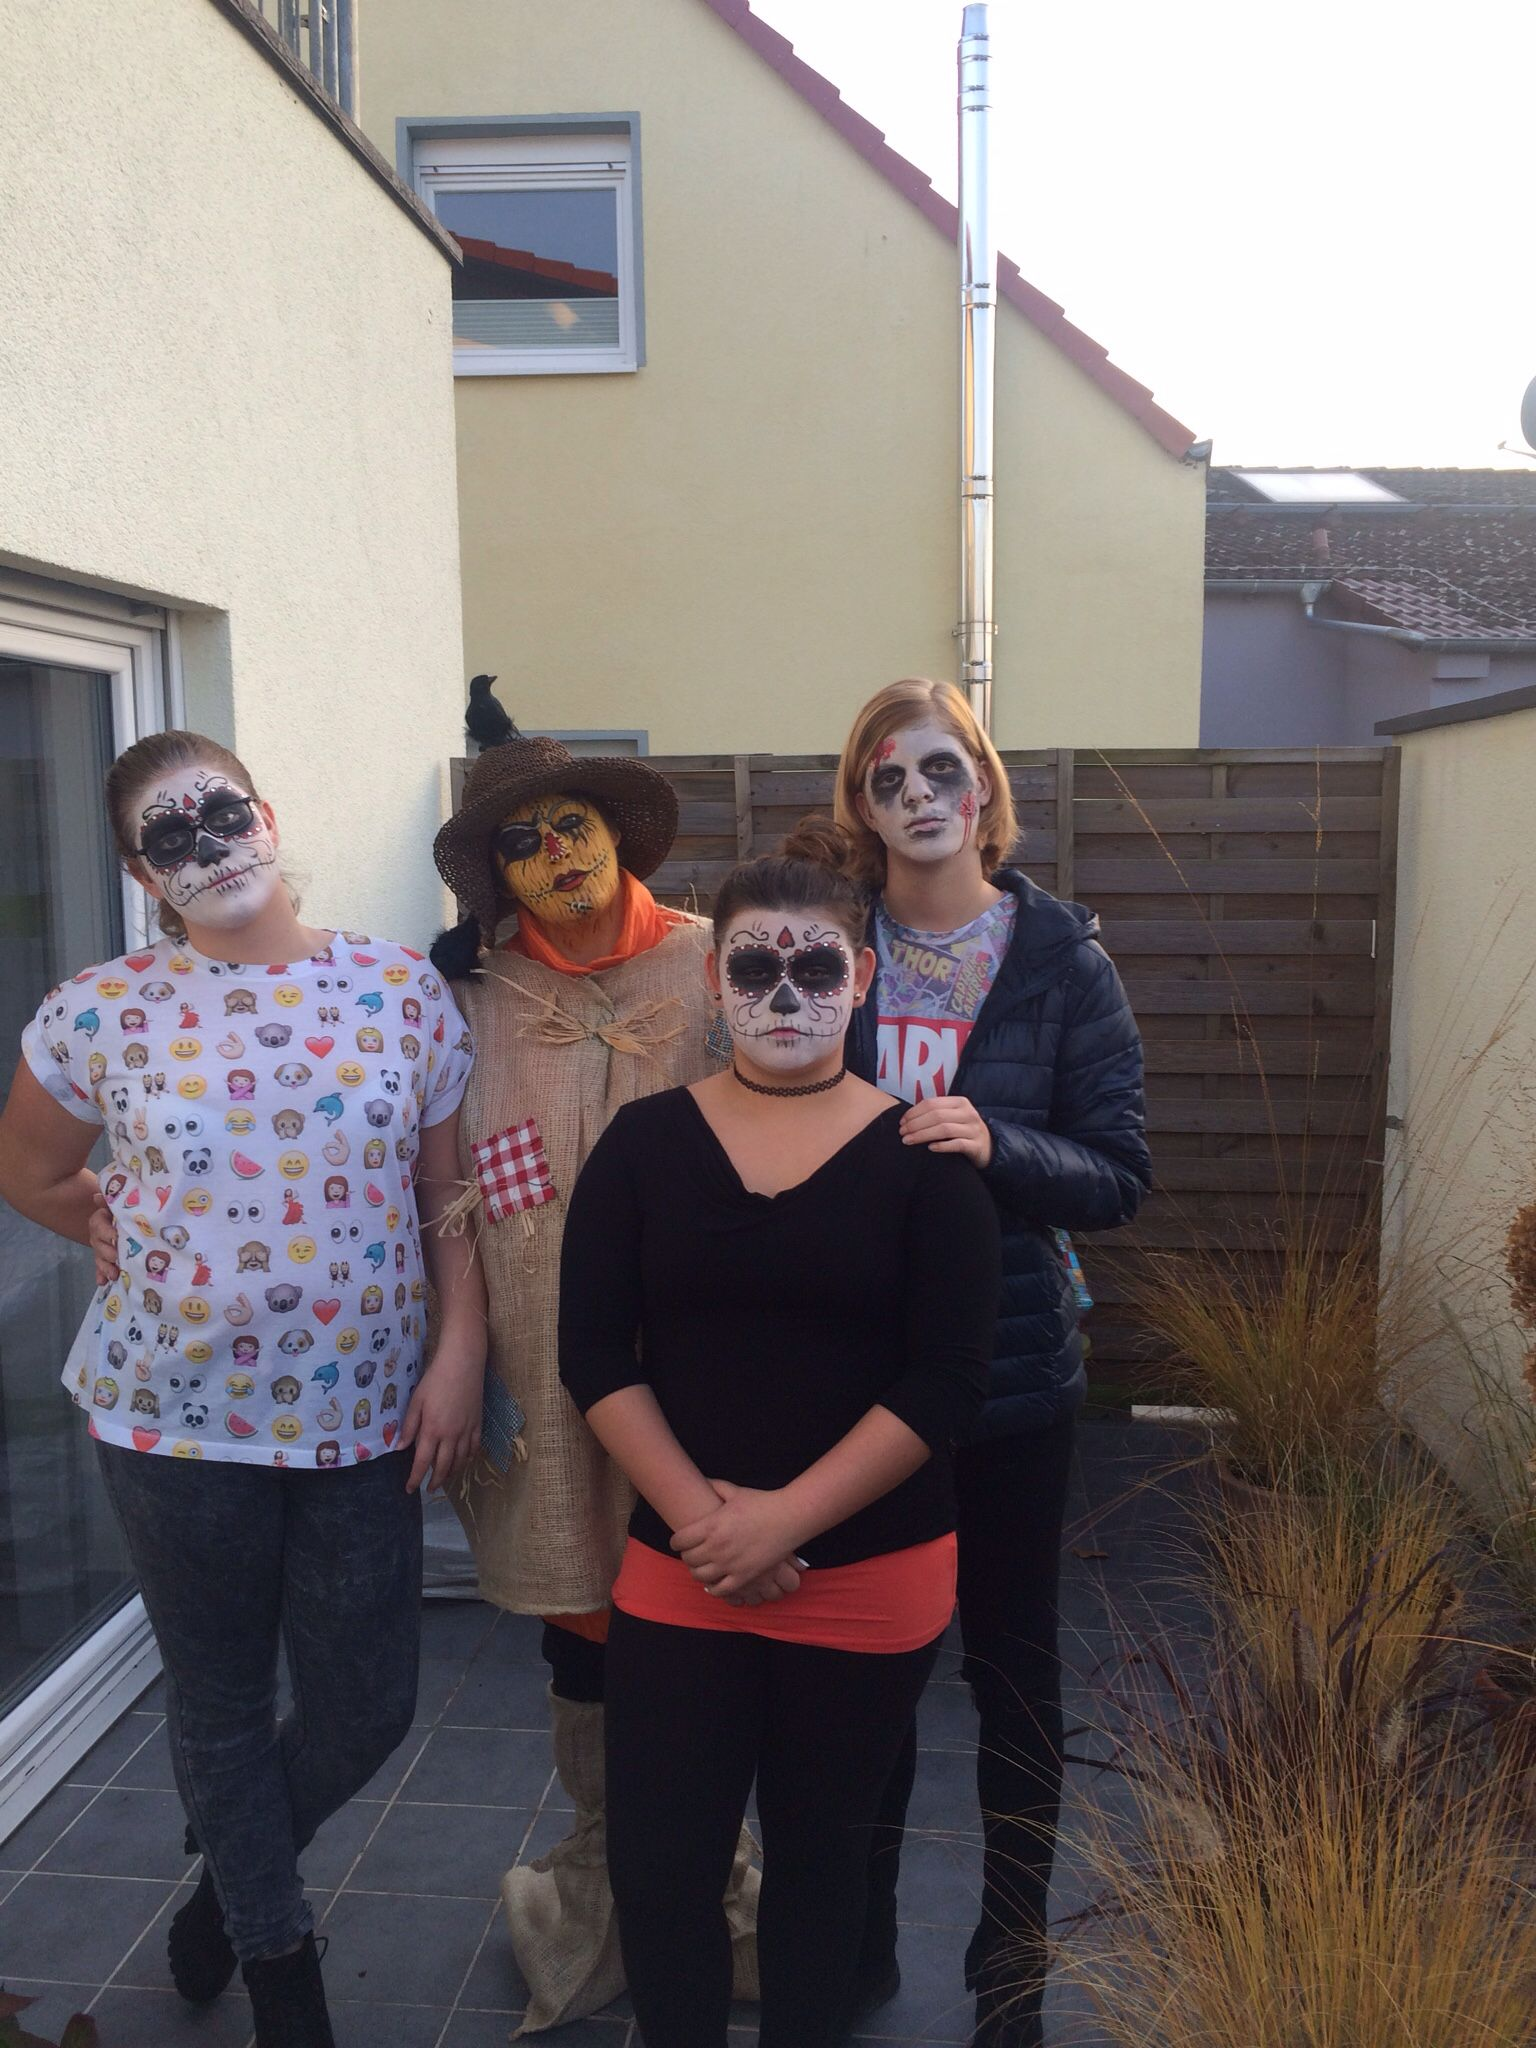 Halloween 2015 in Germany